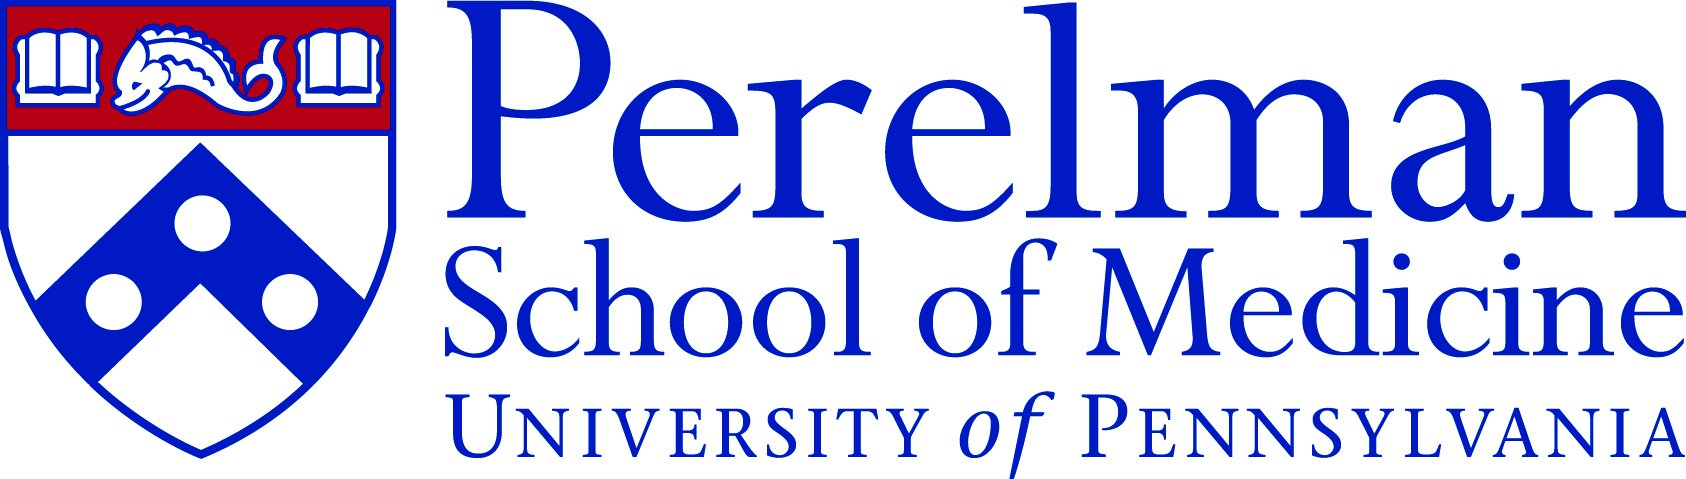 University-of-Pennsylvania-Penn-Medical-School